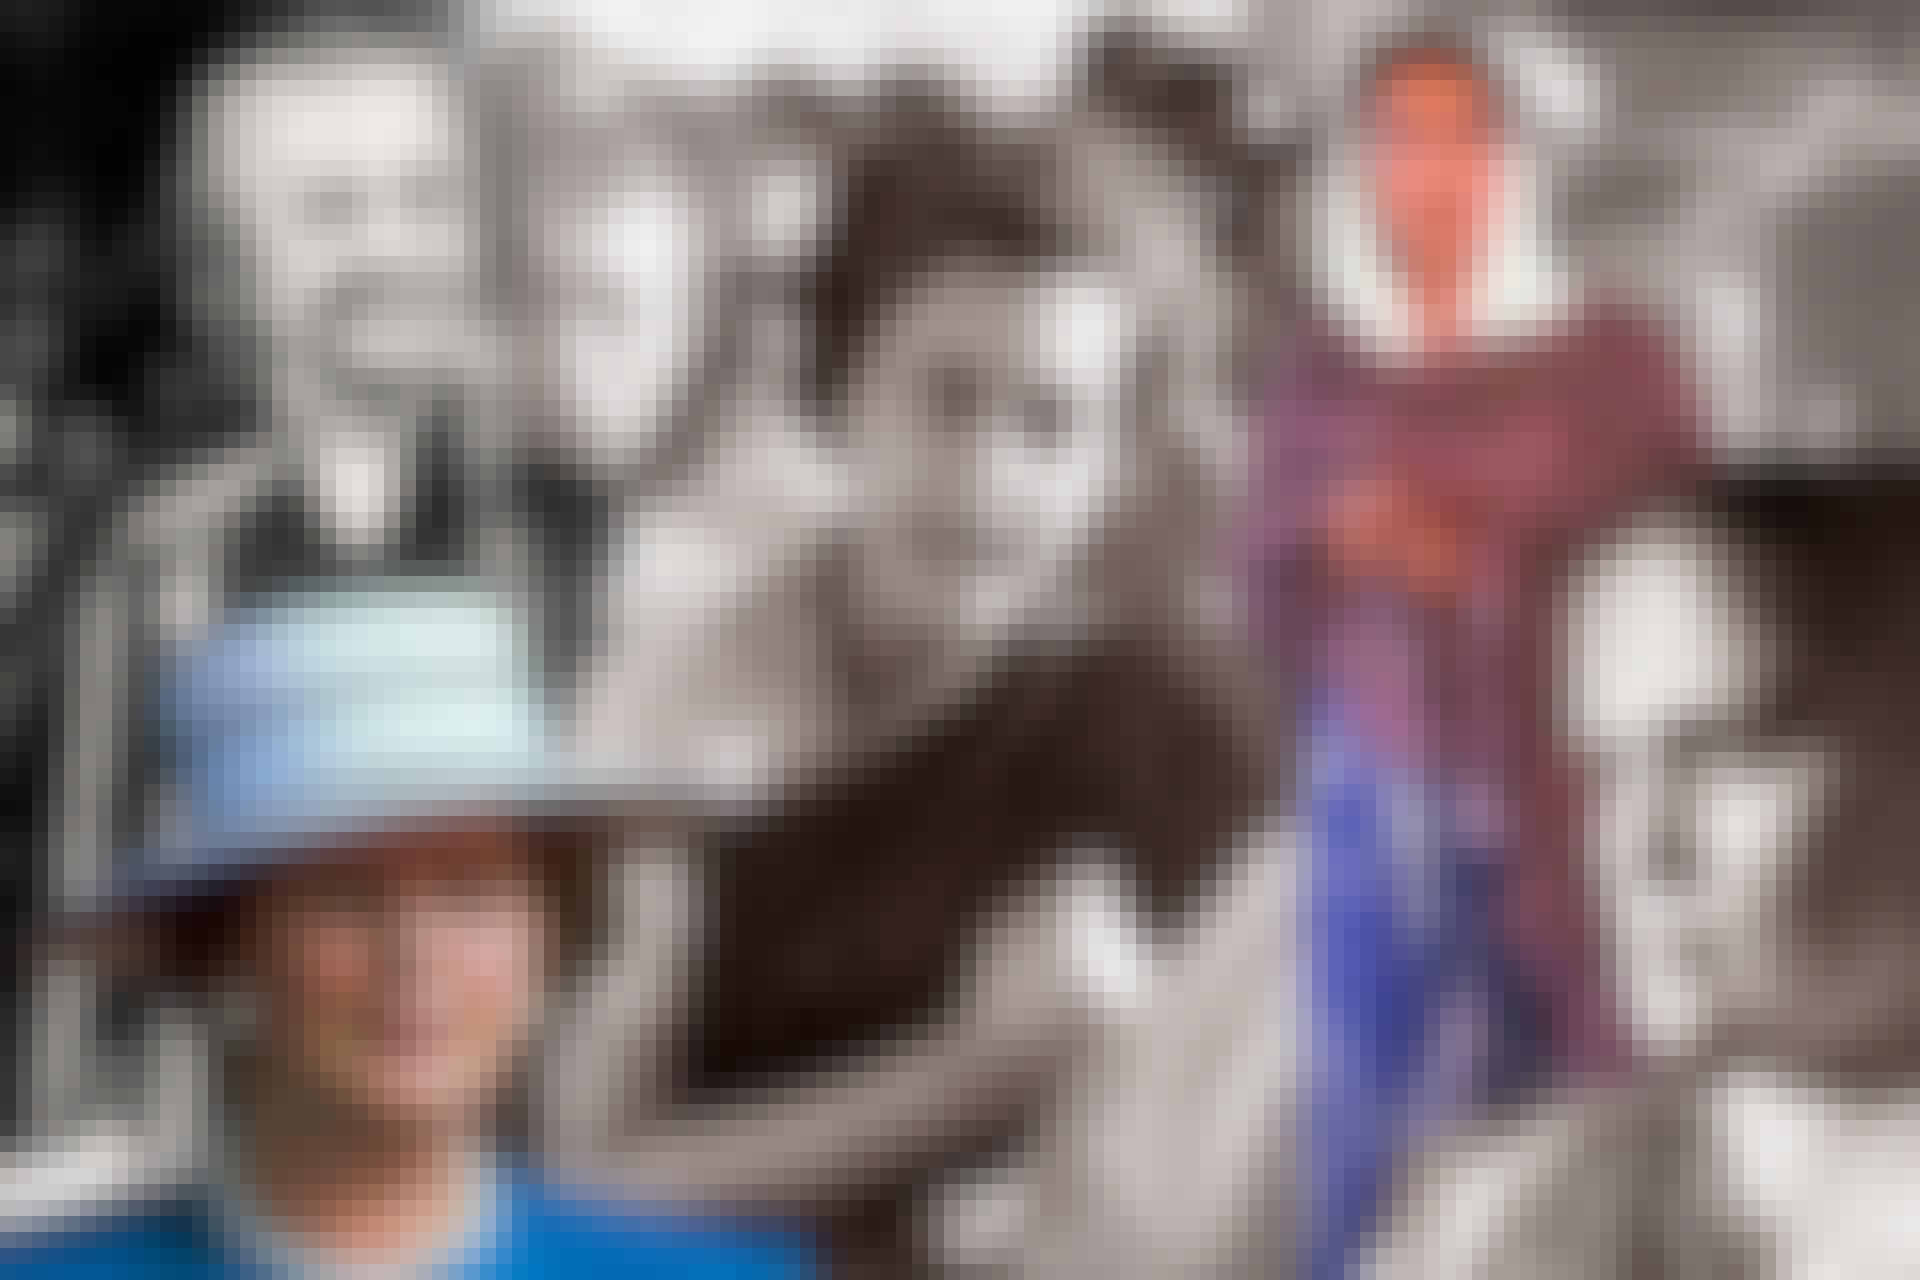 Golda Meir, Margaret Thatcher, Indira Gandhi, Benazir Bhutto ja Bandaranaike, alla kvinnor som varit regeringschefer.